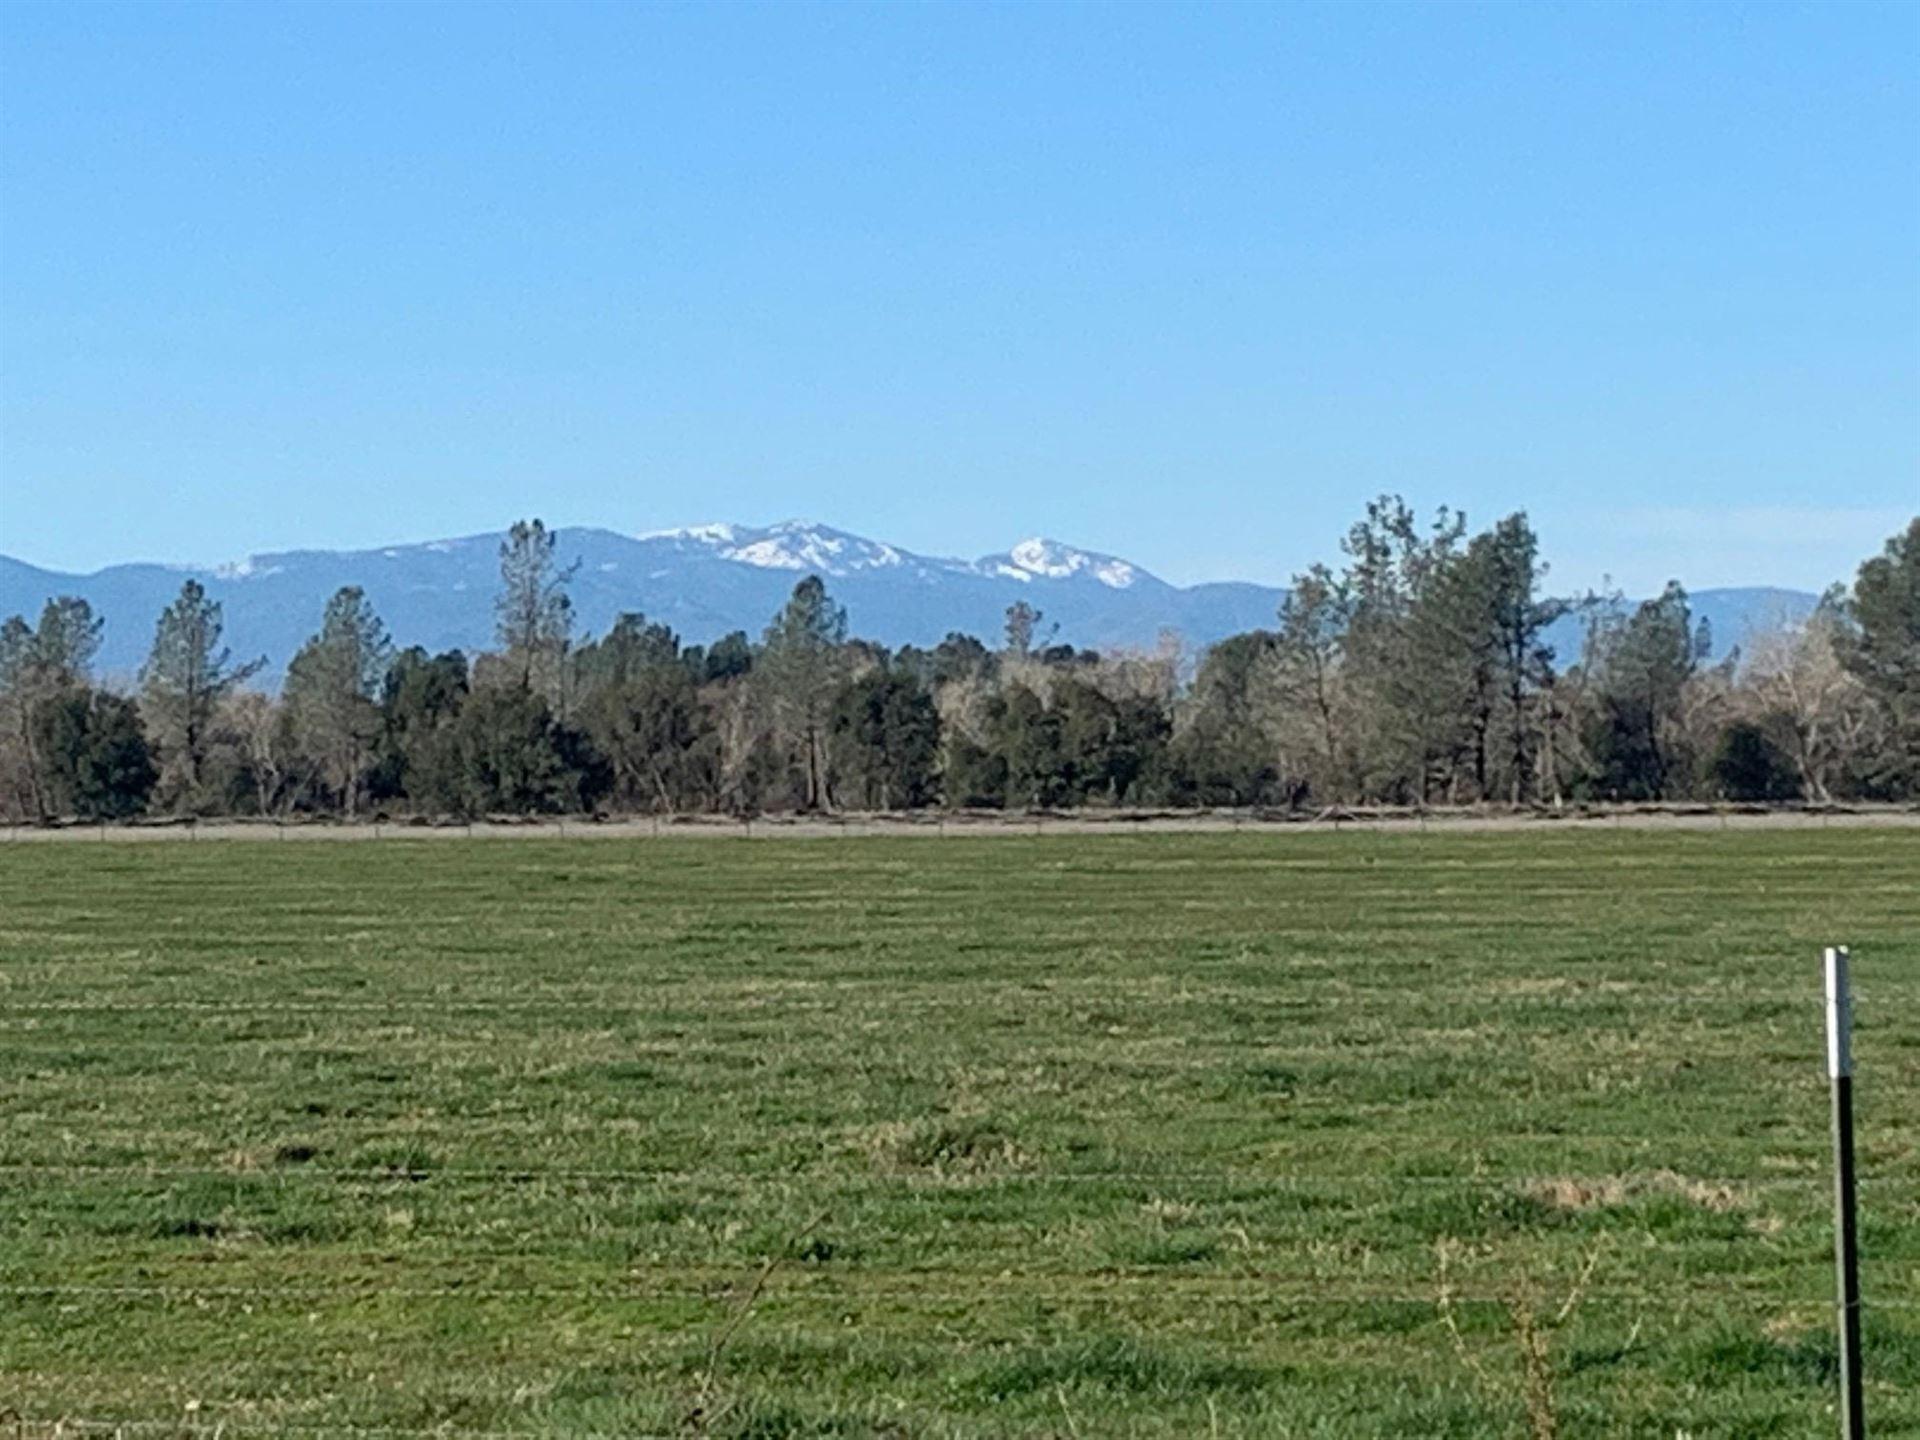 Photo of Sleeping Bull Ln, Cottonwood, Ca 96022 (MLS # 21-684)